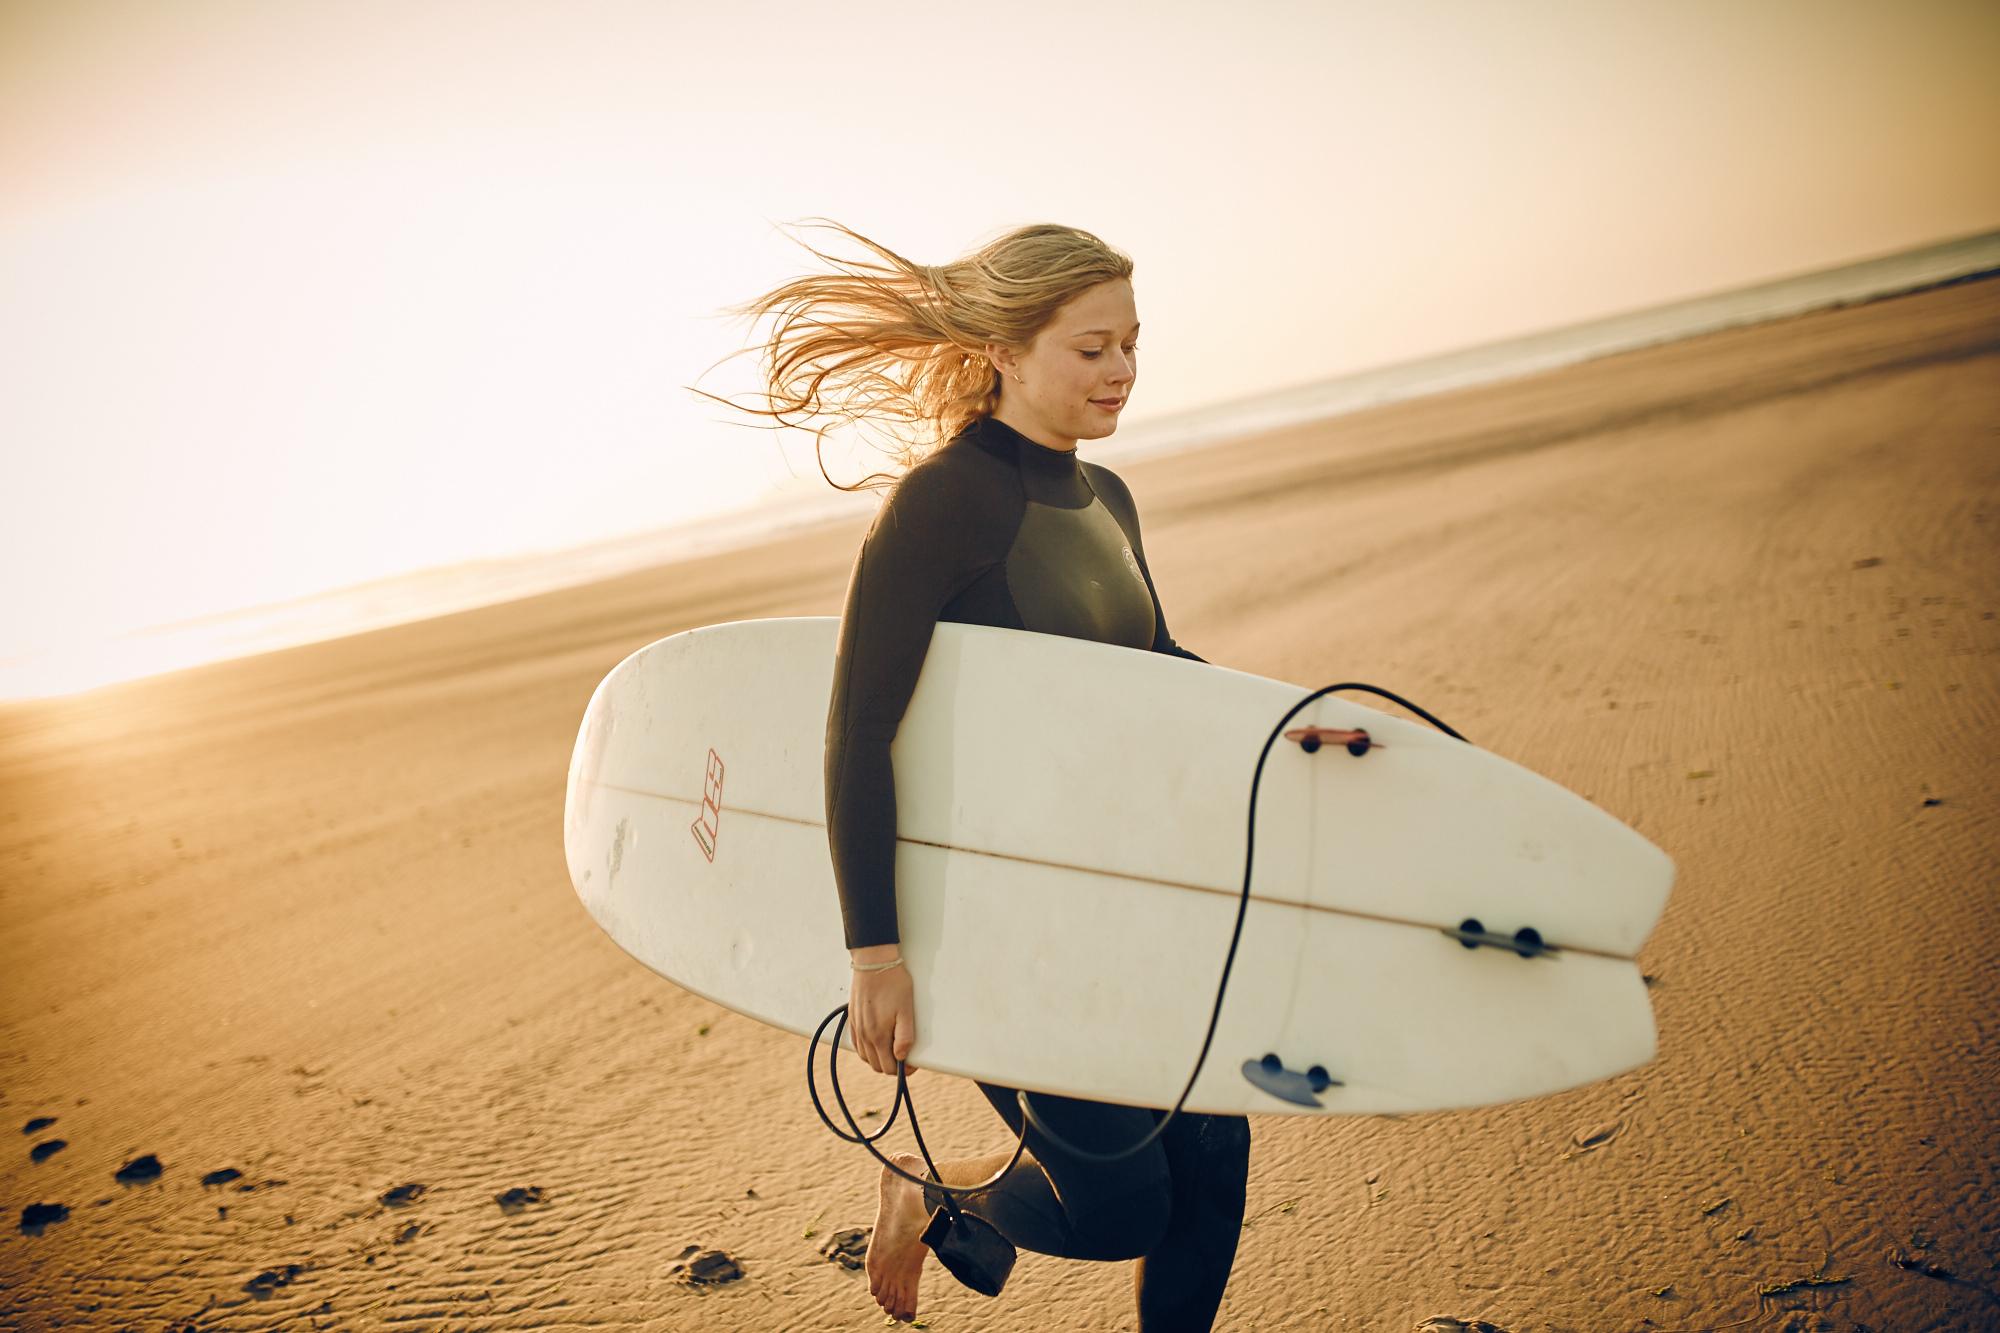 surf lyfestyle 1265.jpg